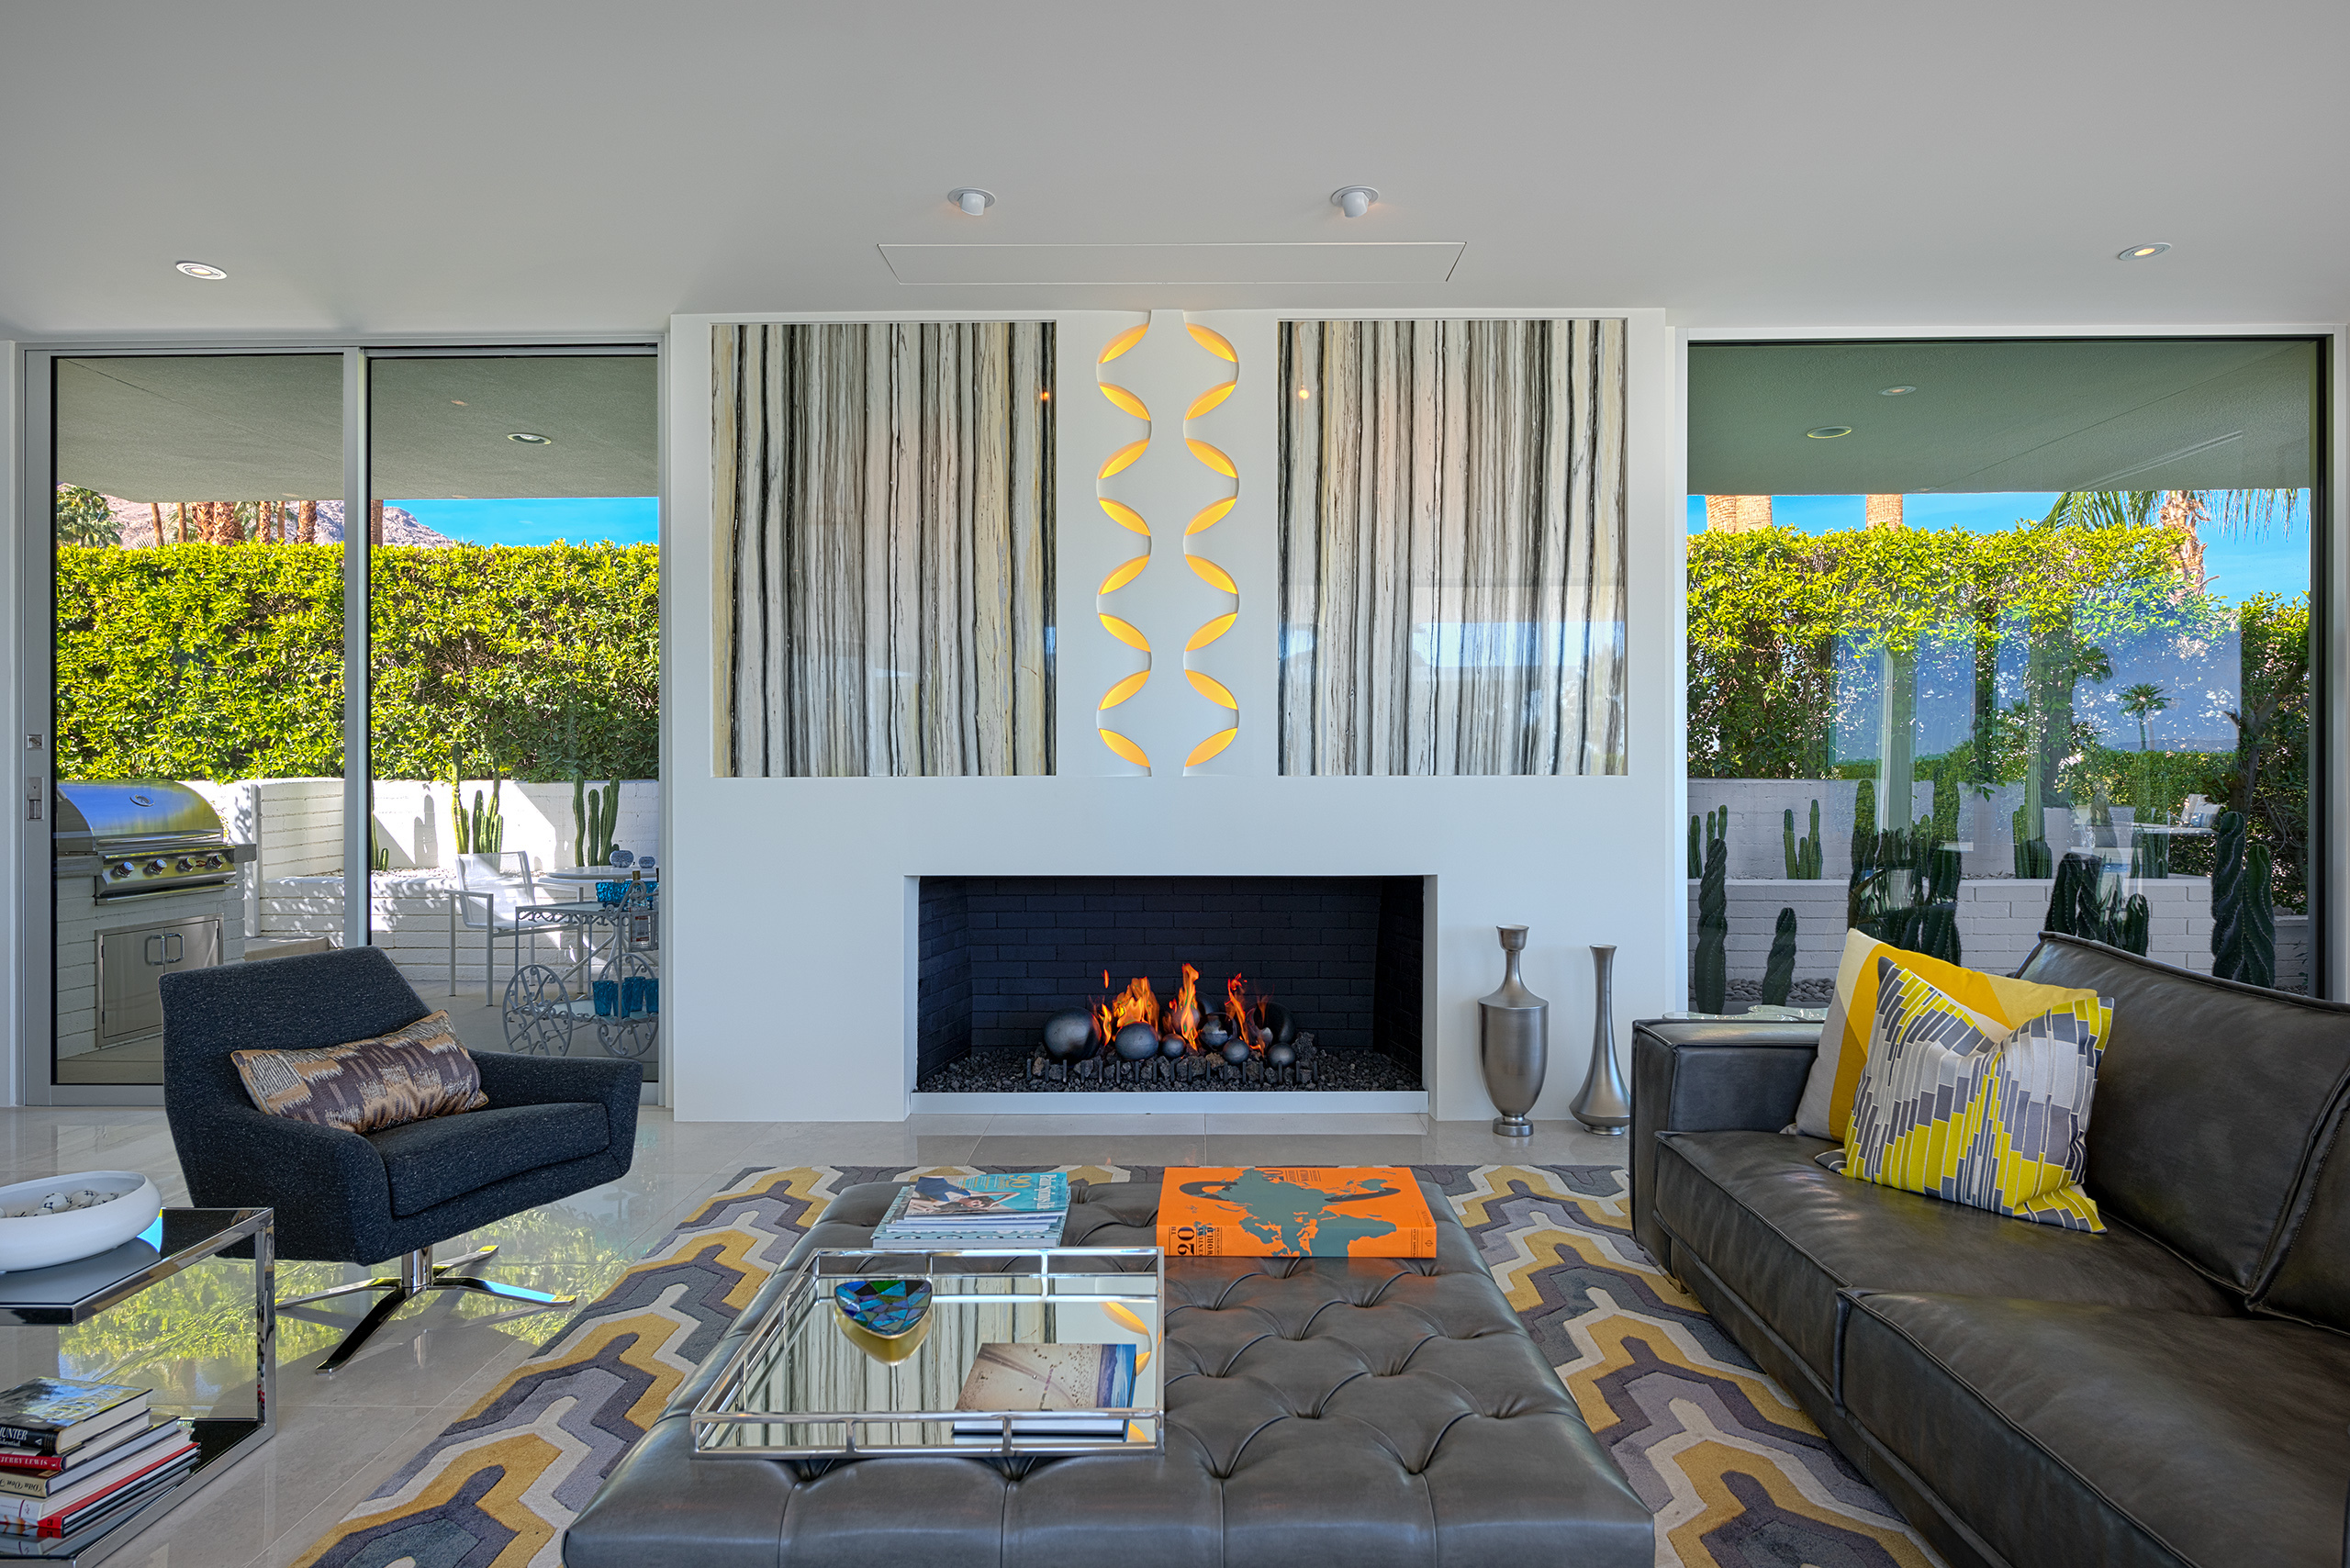 Hildi Trading Spaces 1960s California Getaway Gleamingly Refurbished Asks 3m